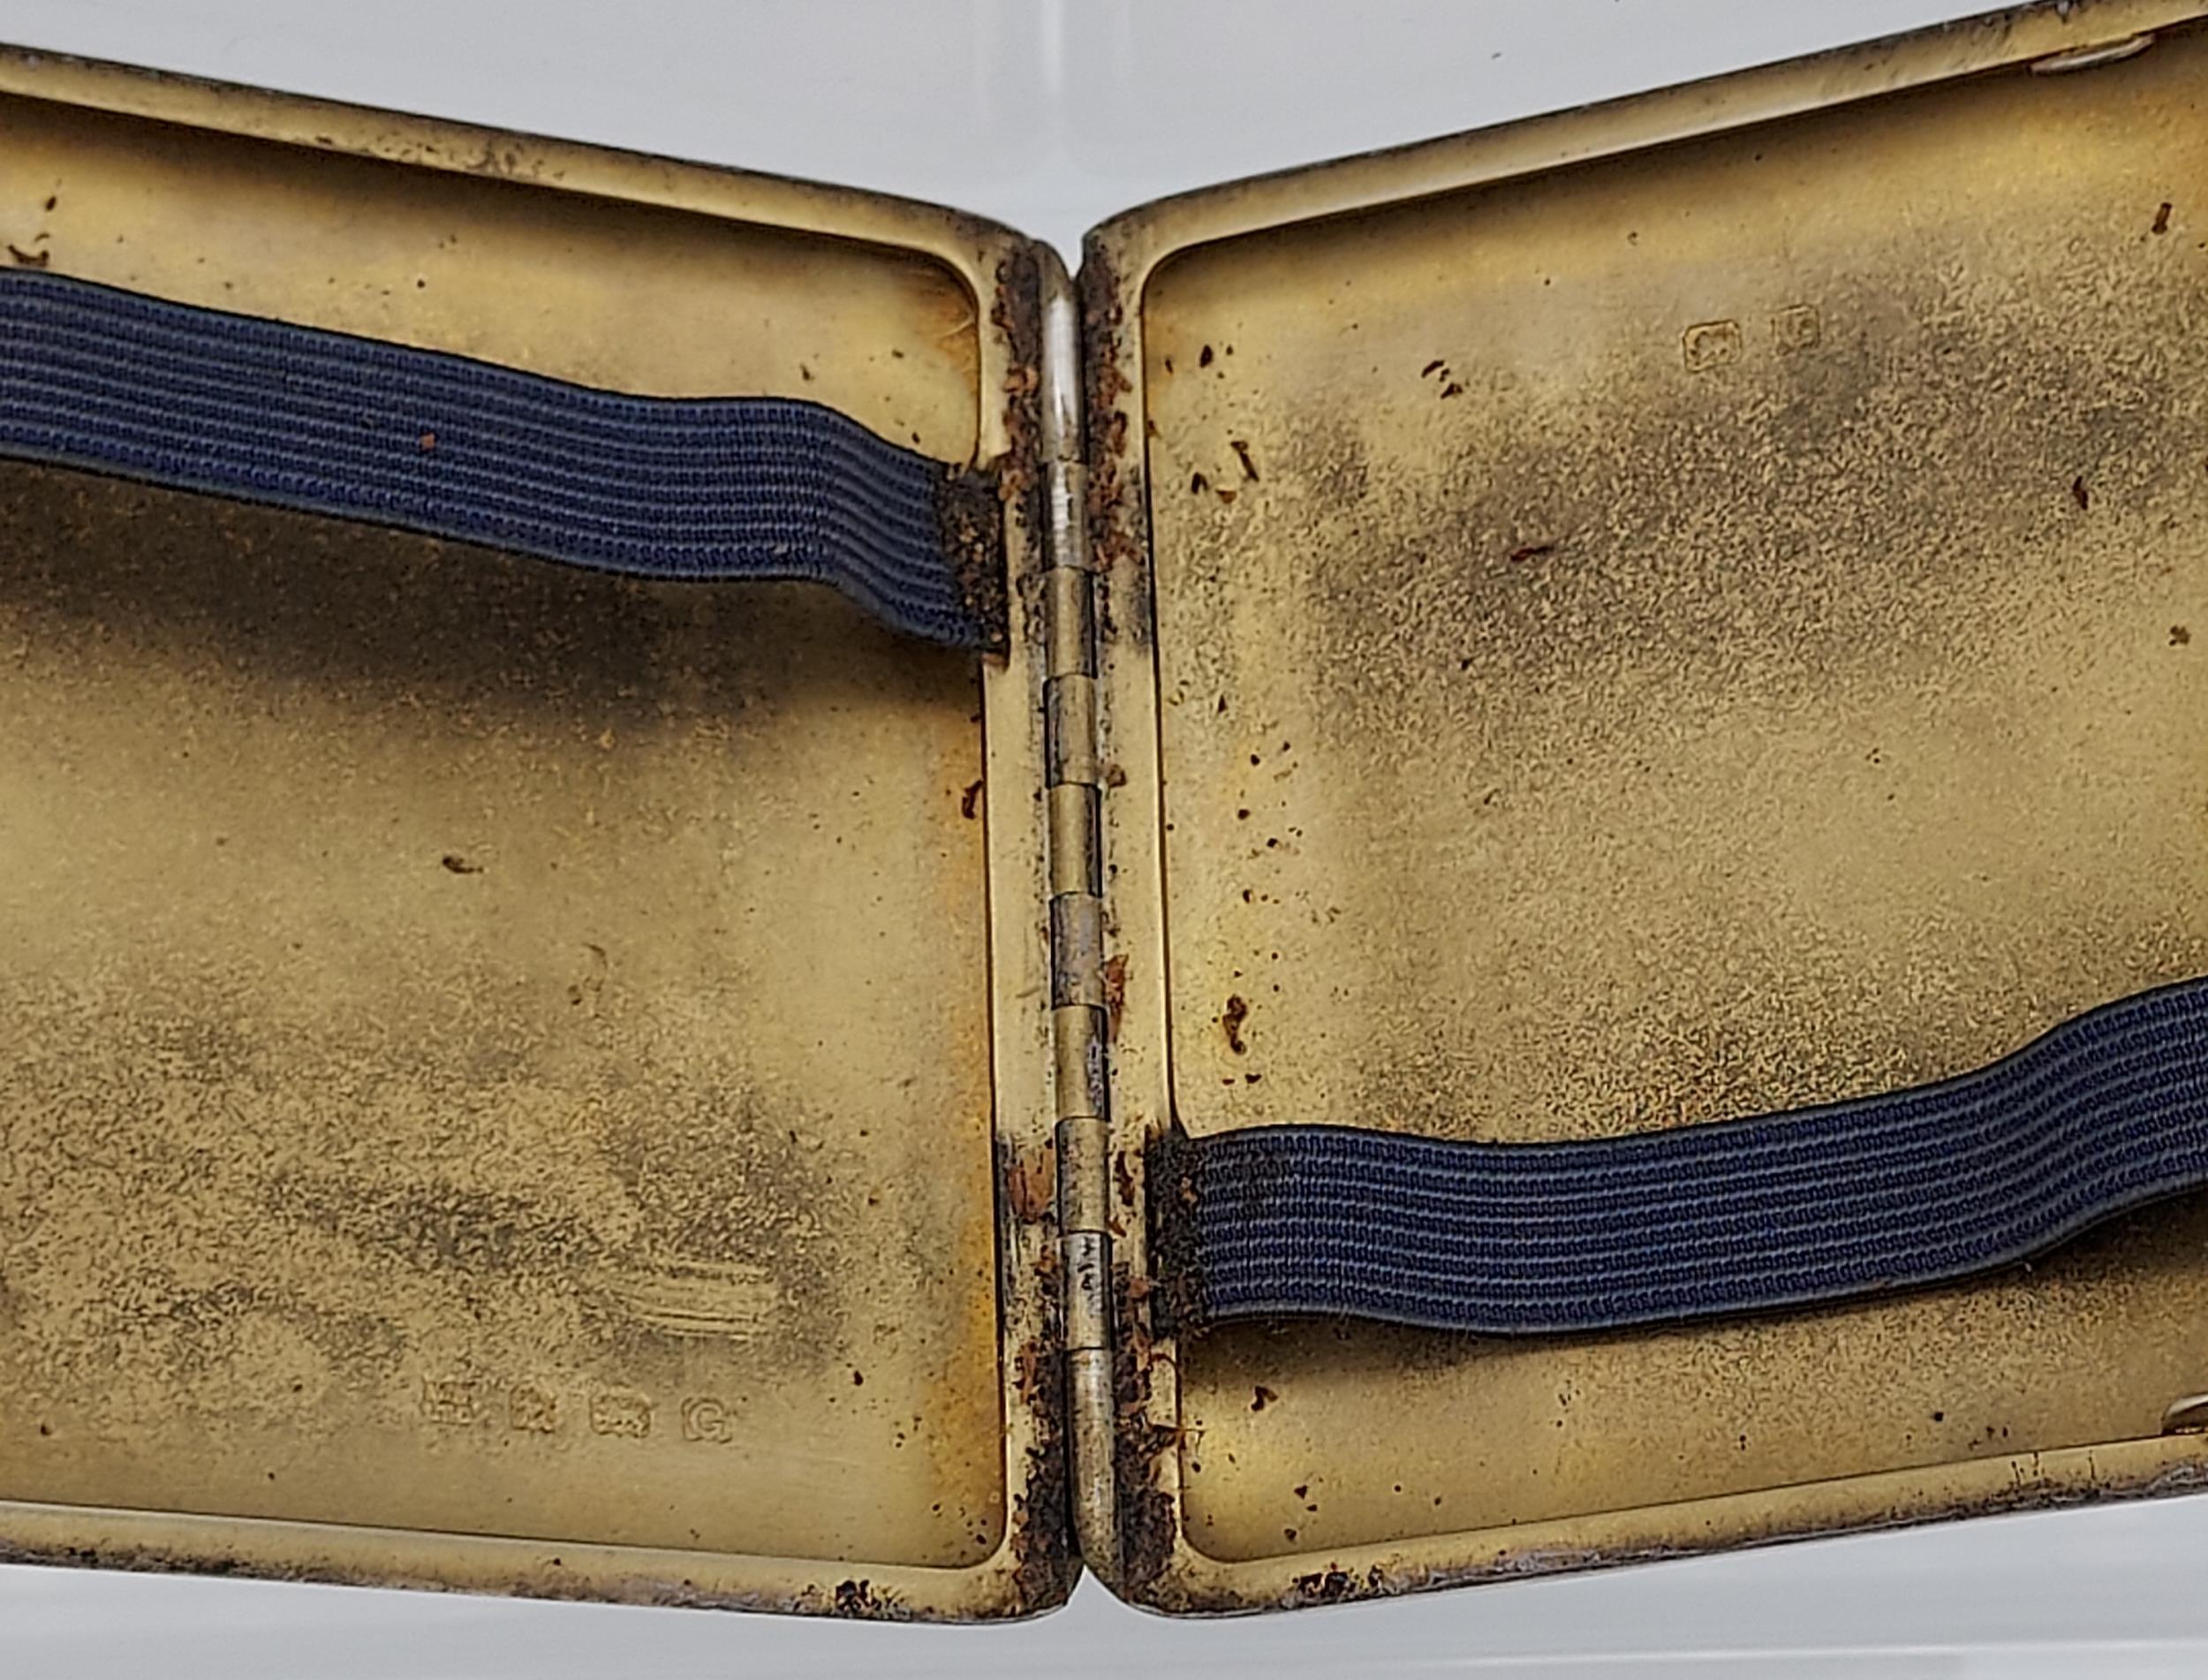 A Birmingham silver Art Deco design cigarette case [99.96grams] - Image 5 of 5